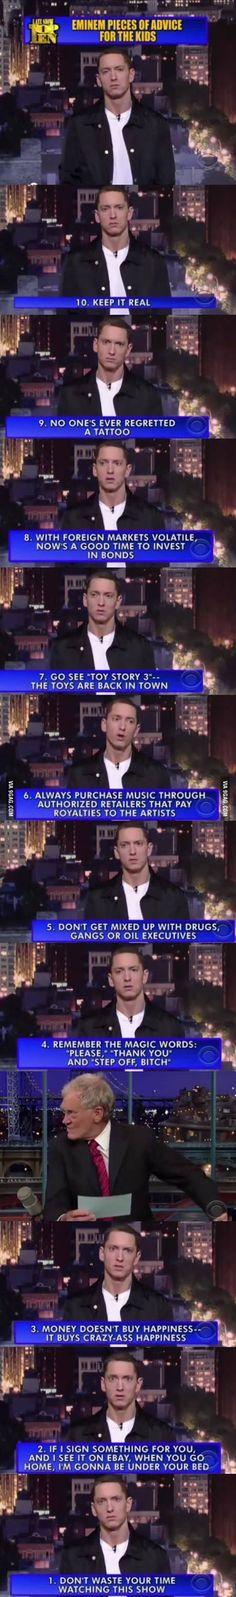 Eminem's 10 advices for kids.  Love him!